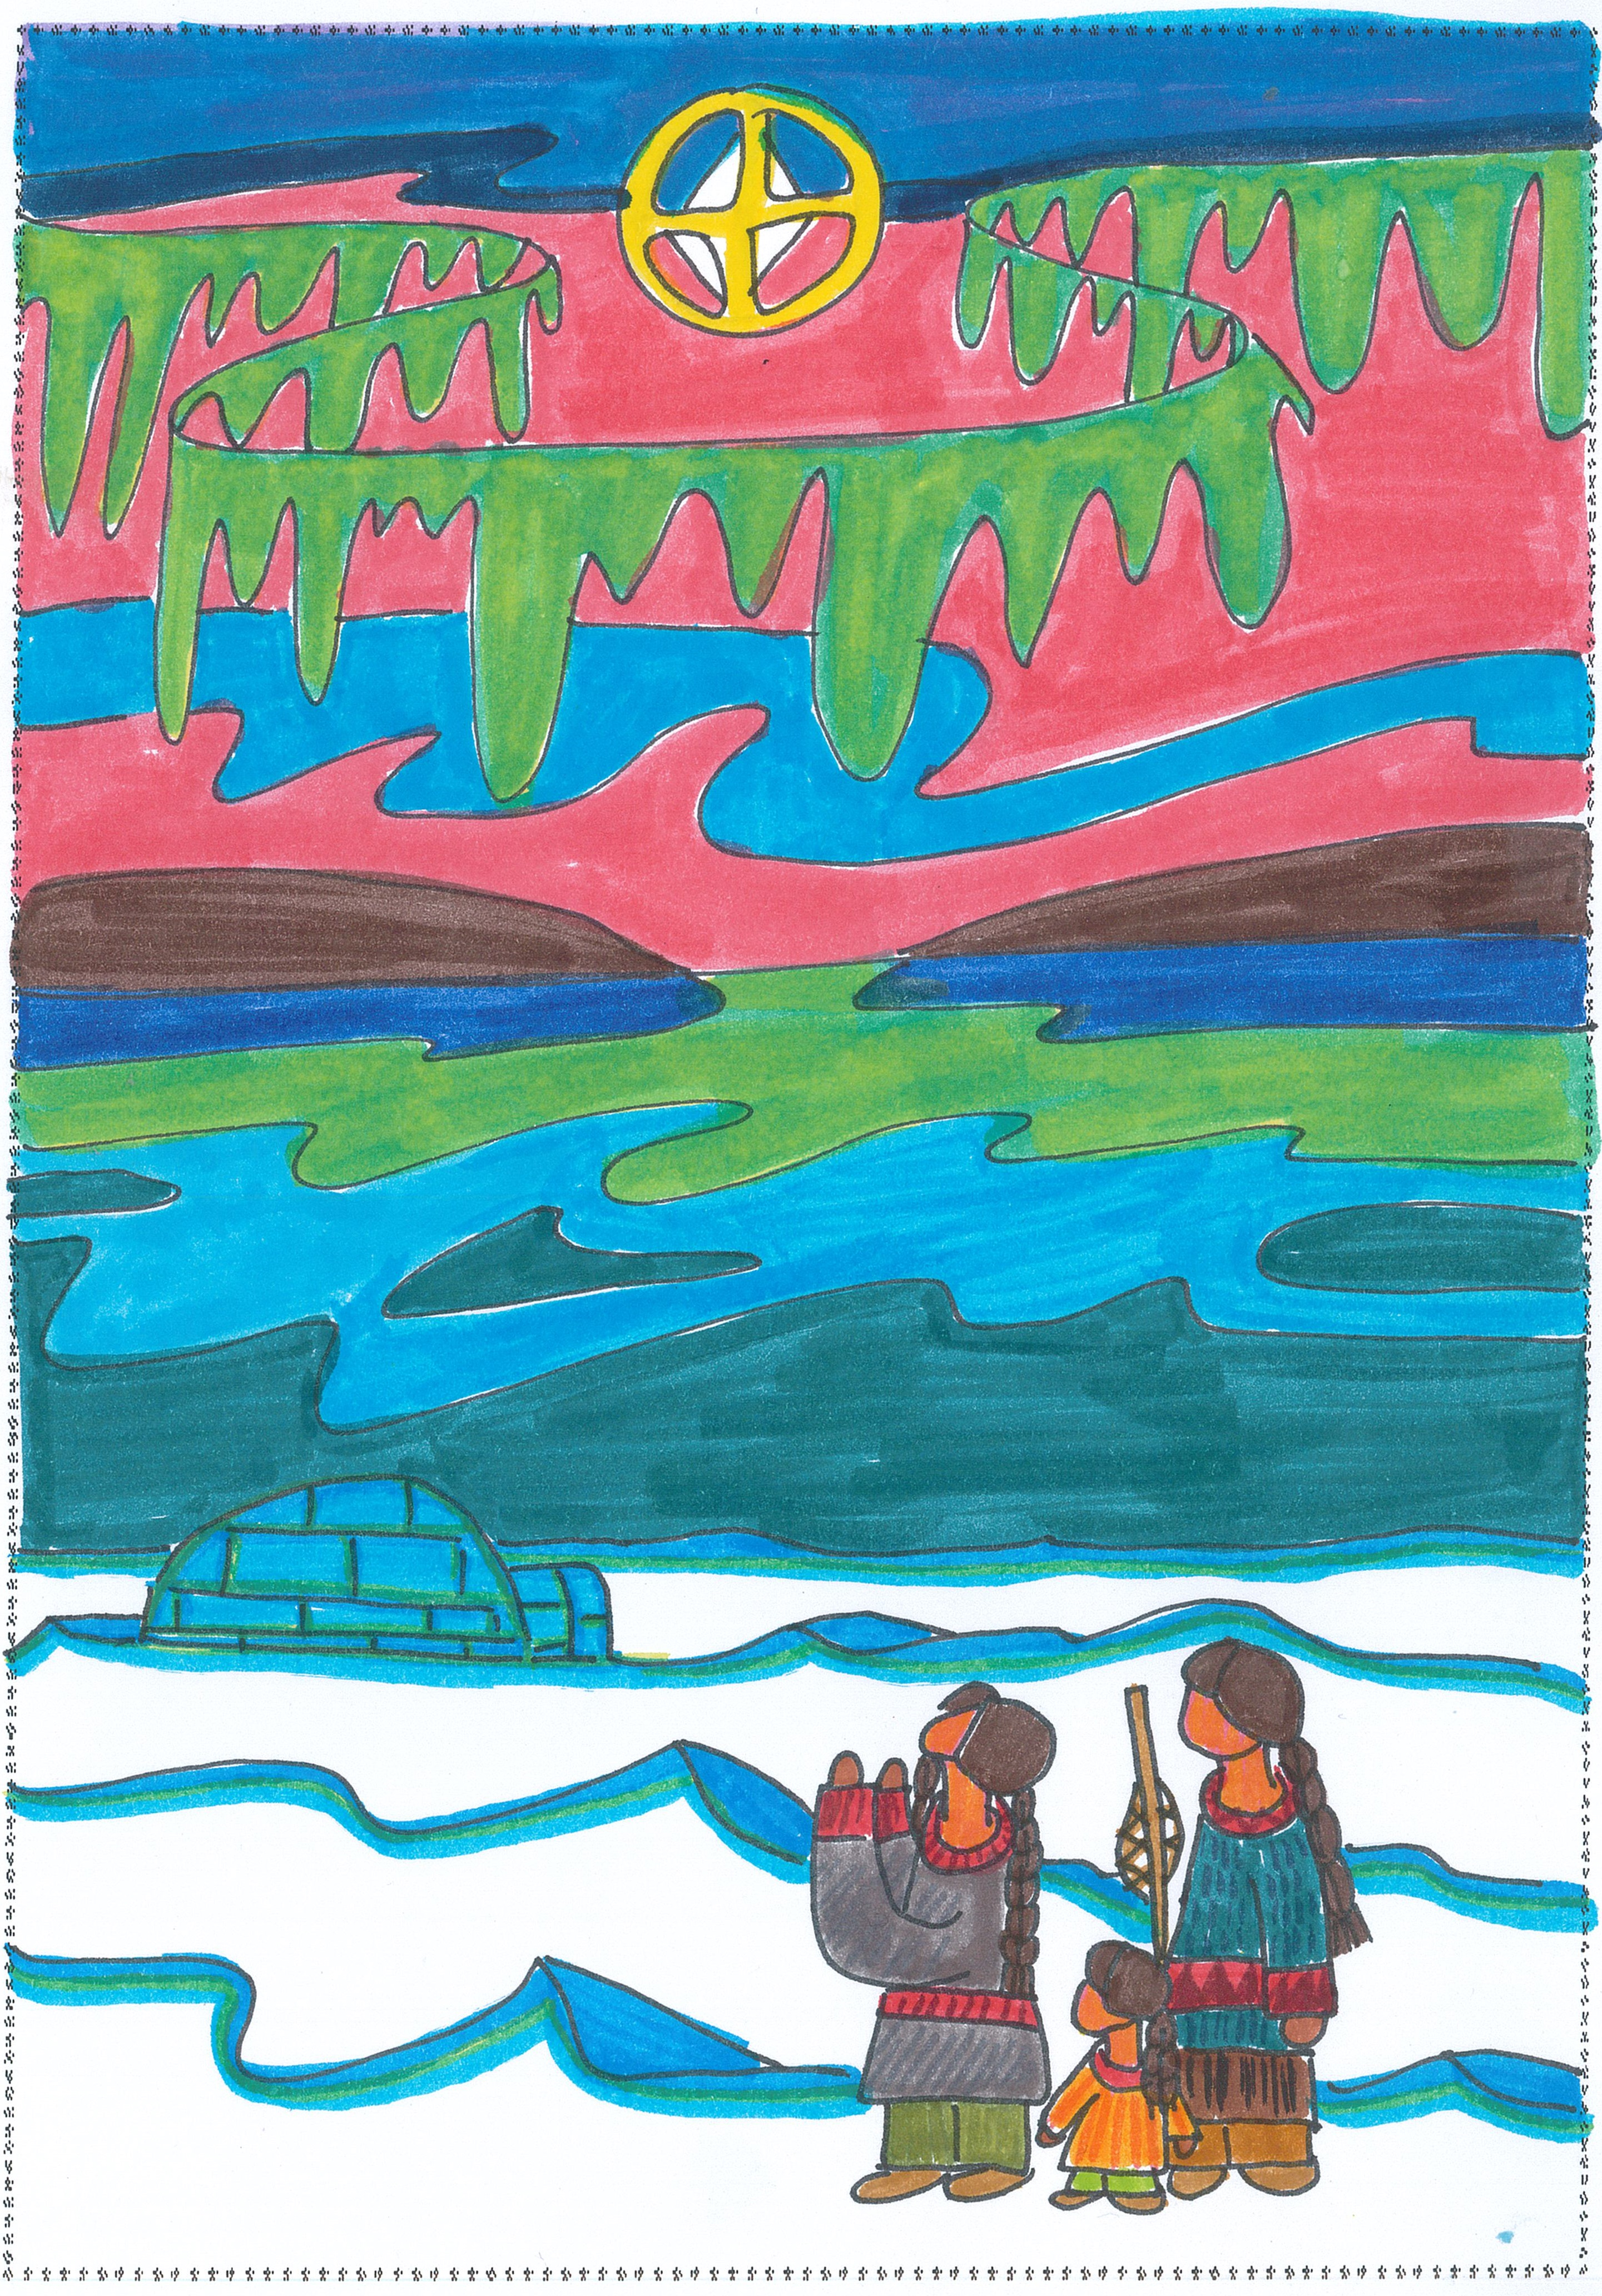 Ten year old ontario boy wins annual pier 1 importsunicefowlkids ten year old ontario boy wins annual pier 1 importsunicefowlkids greeting card contest kristyandbryce Image collections